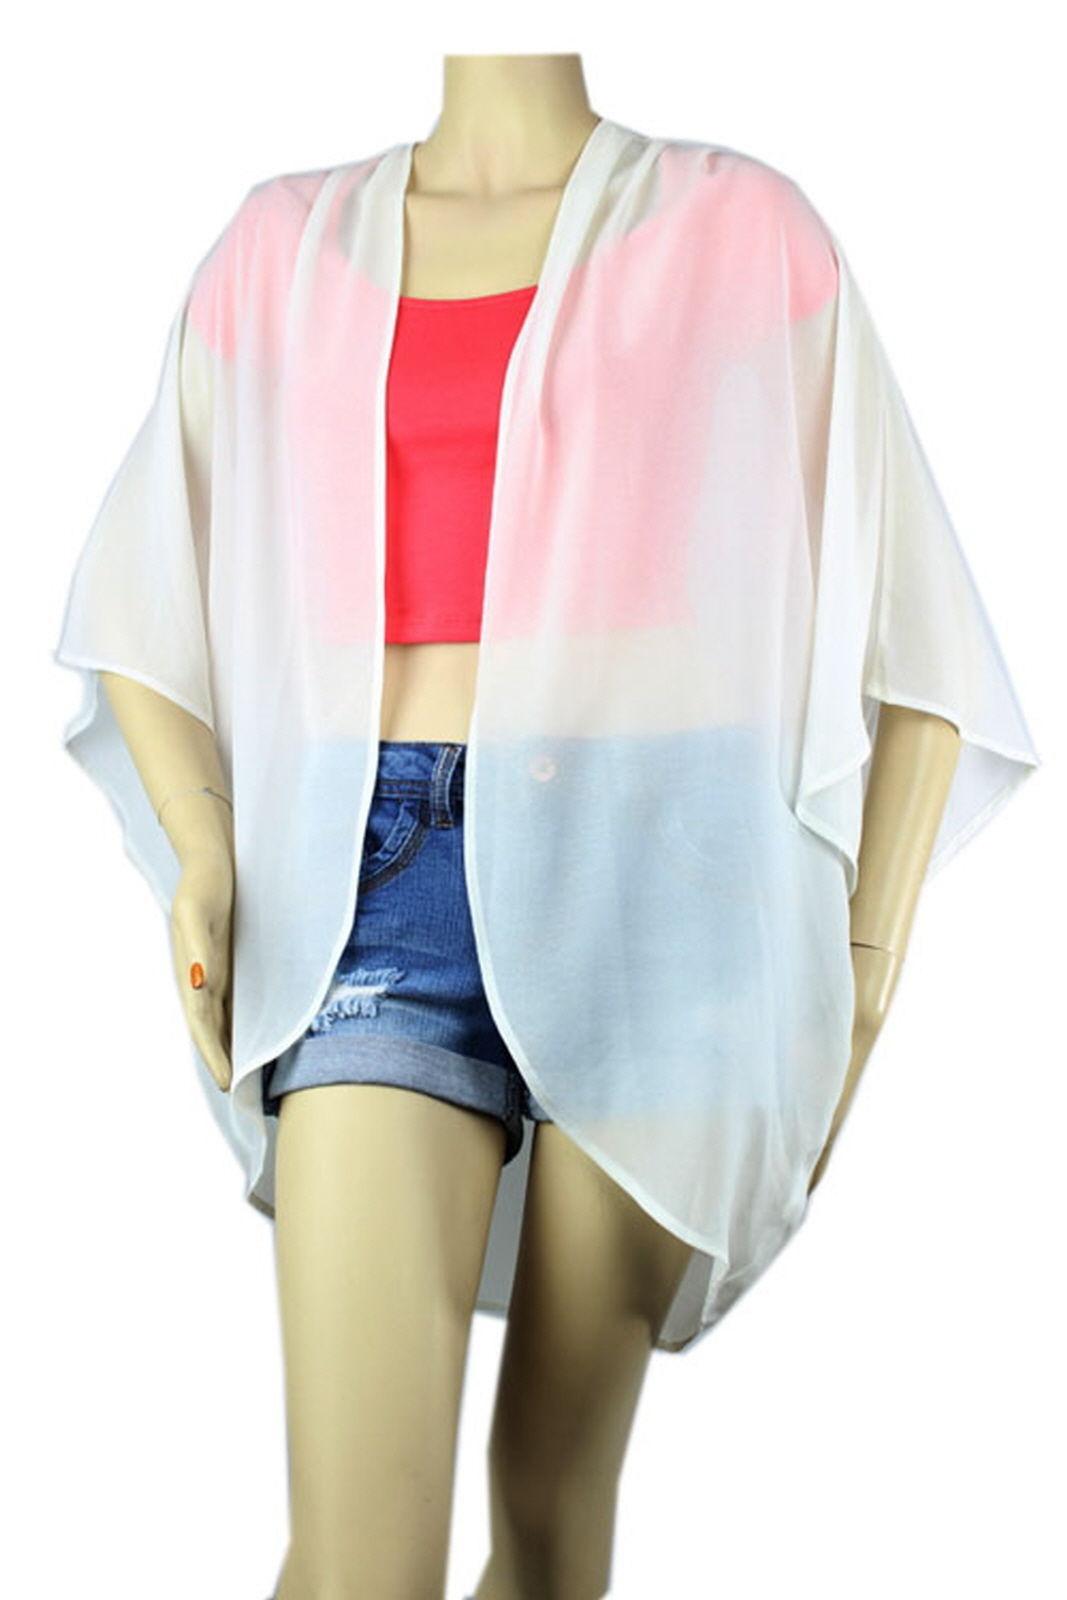 OPEN Layer Pleat Chiffon CARDIGAN Top Loose Fit Kimono Summer Blouse Shirts S-3X